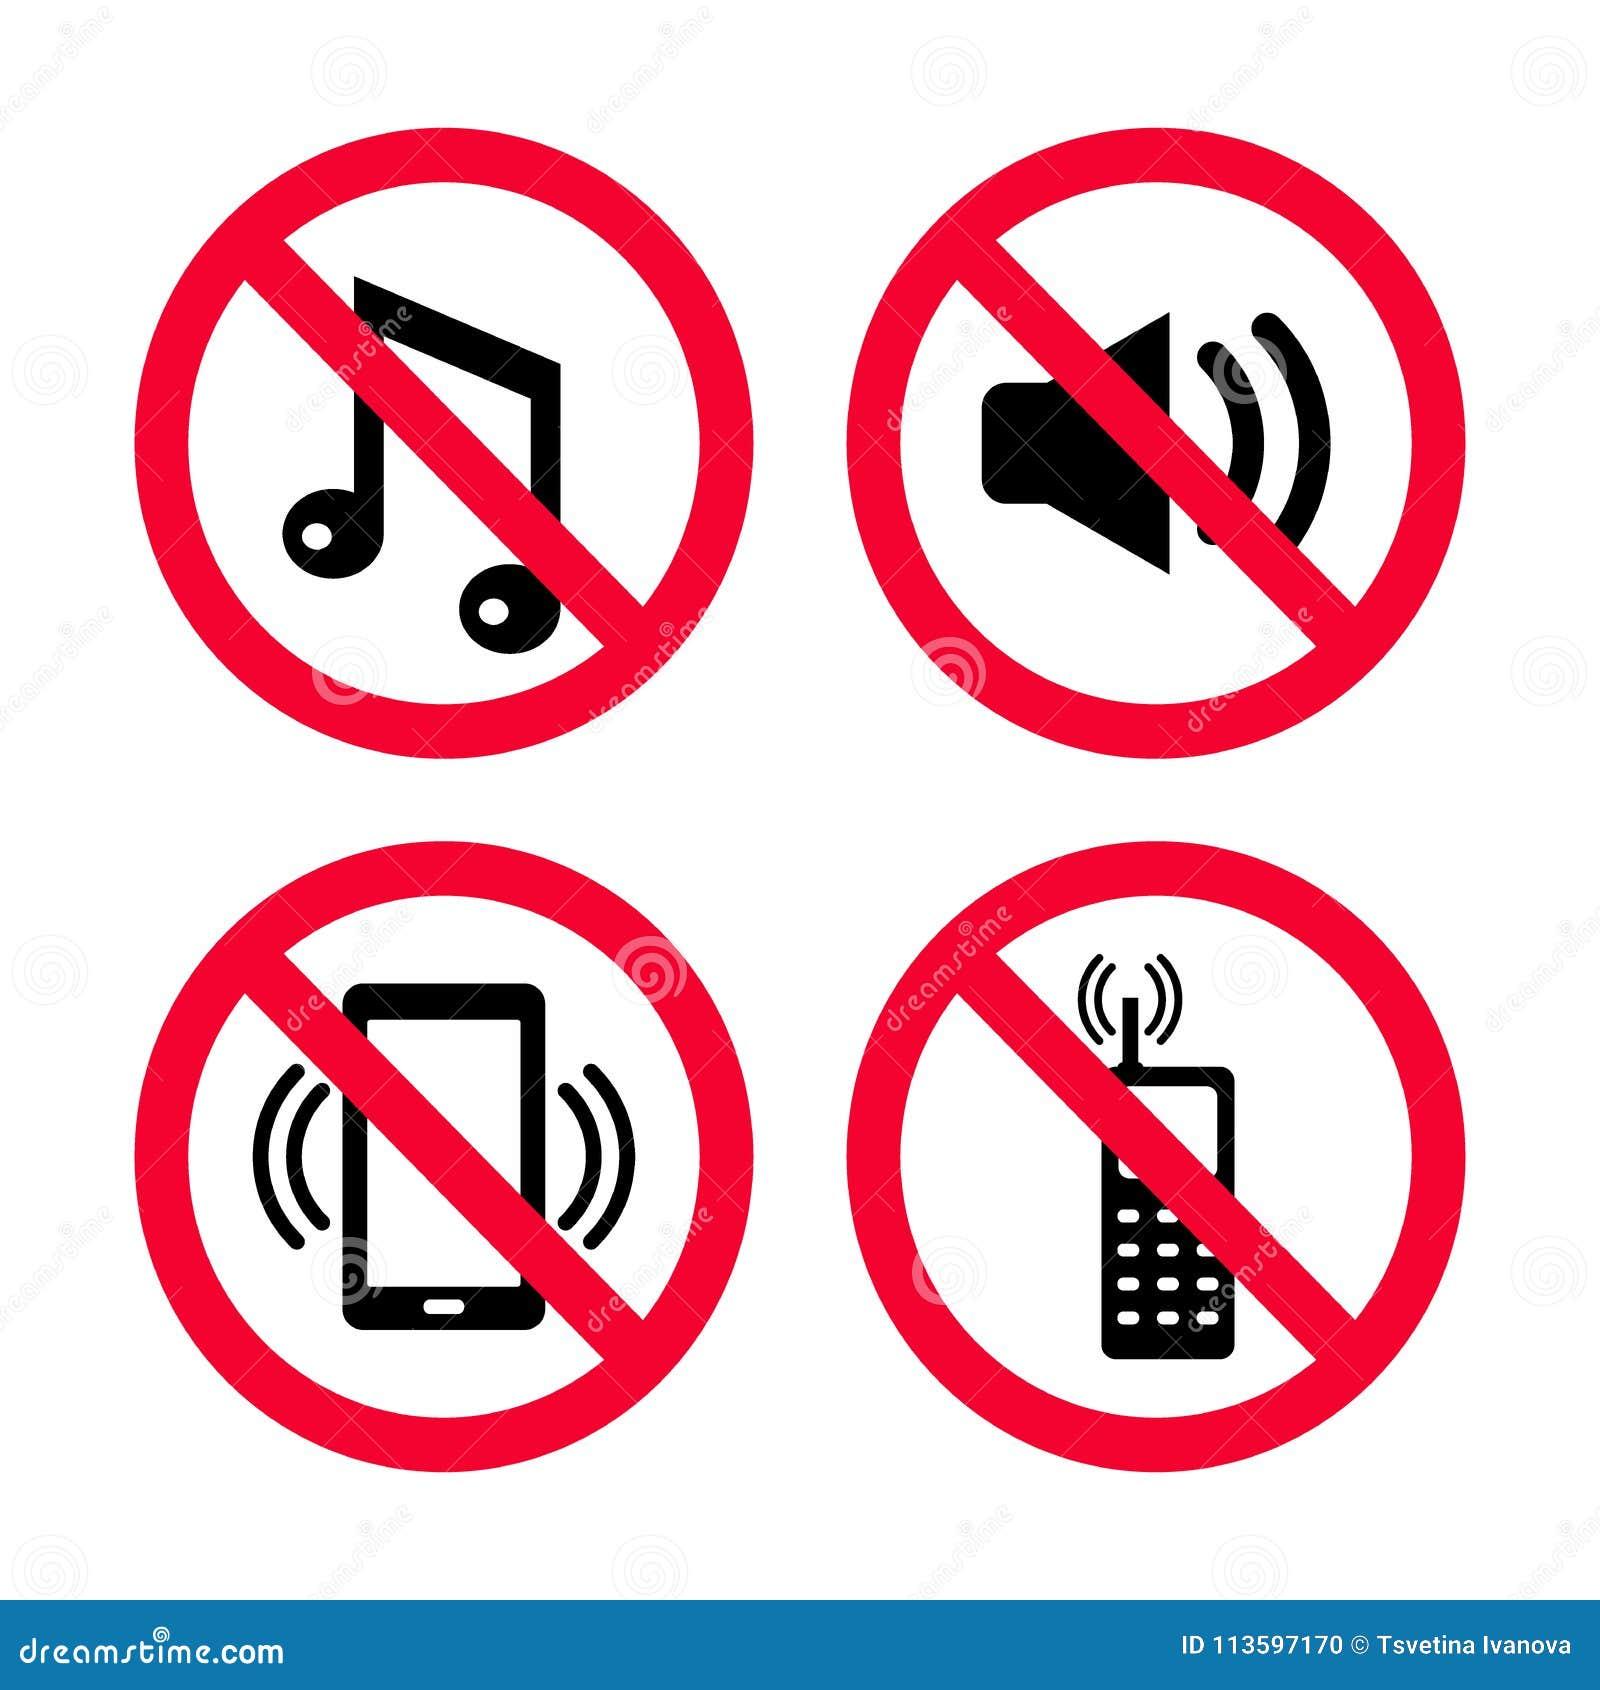 don t make noise no mobile phones no music no loud noises red